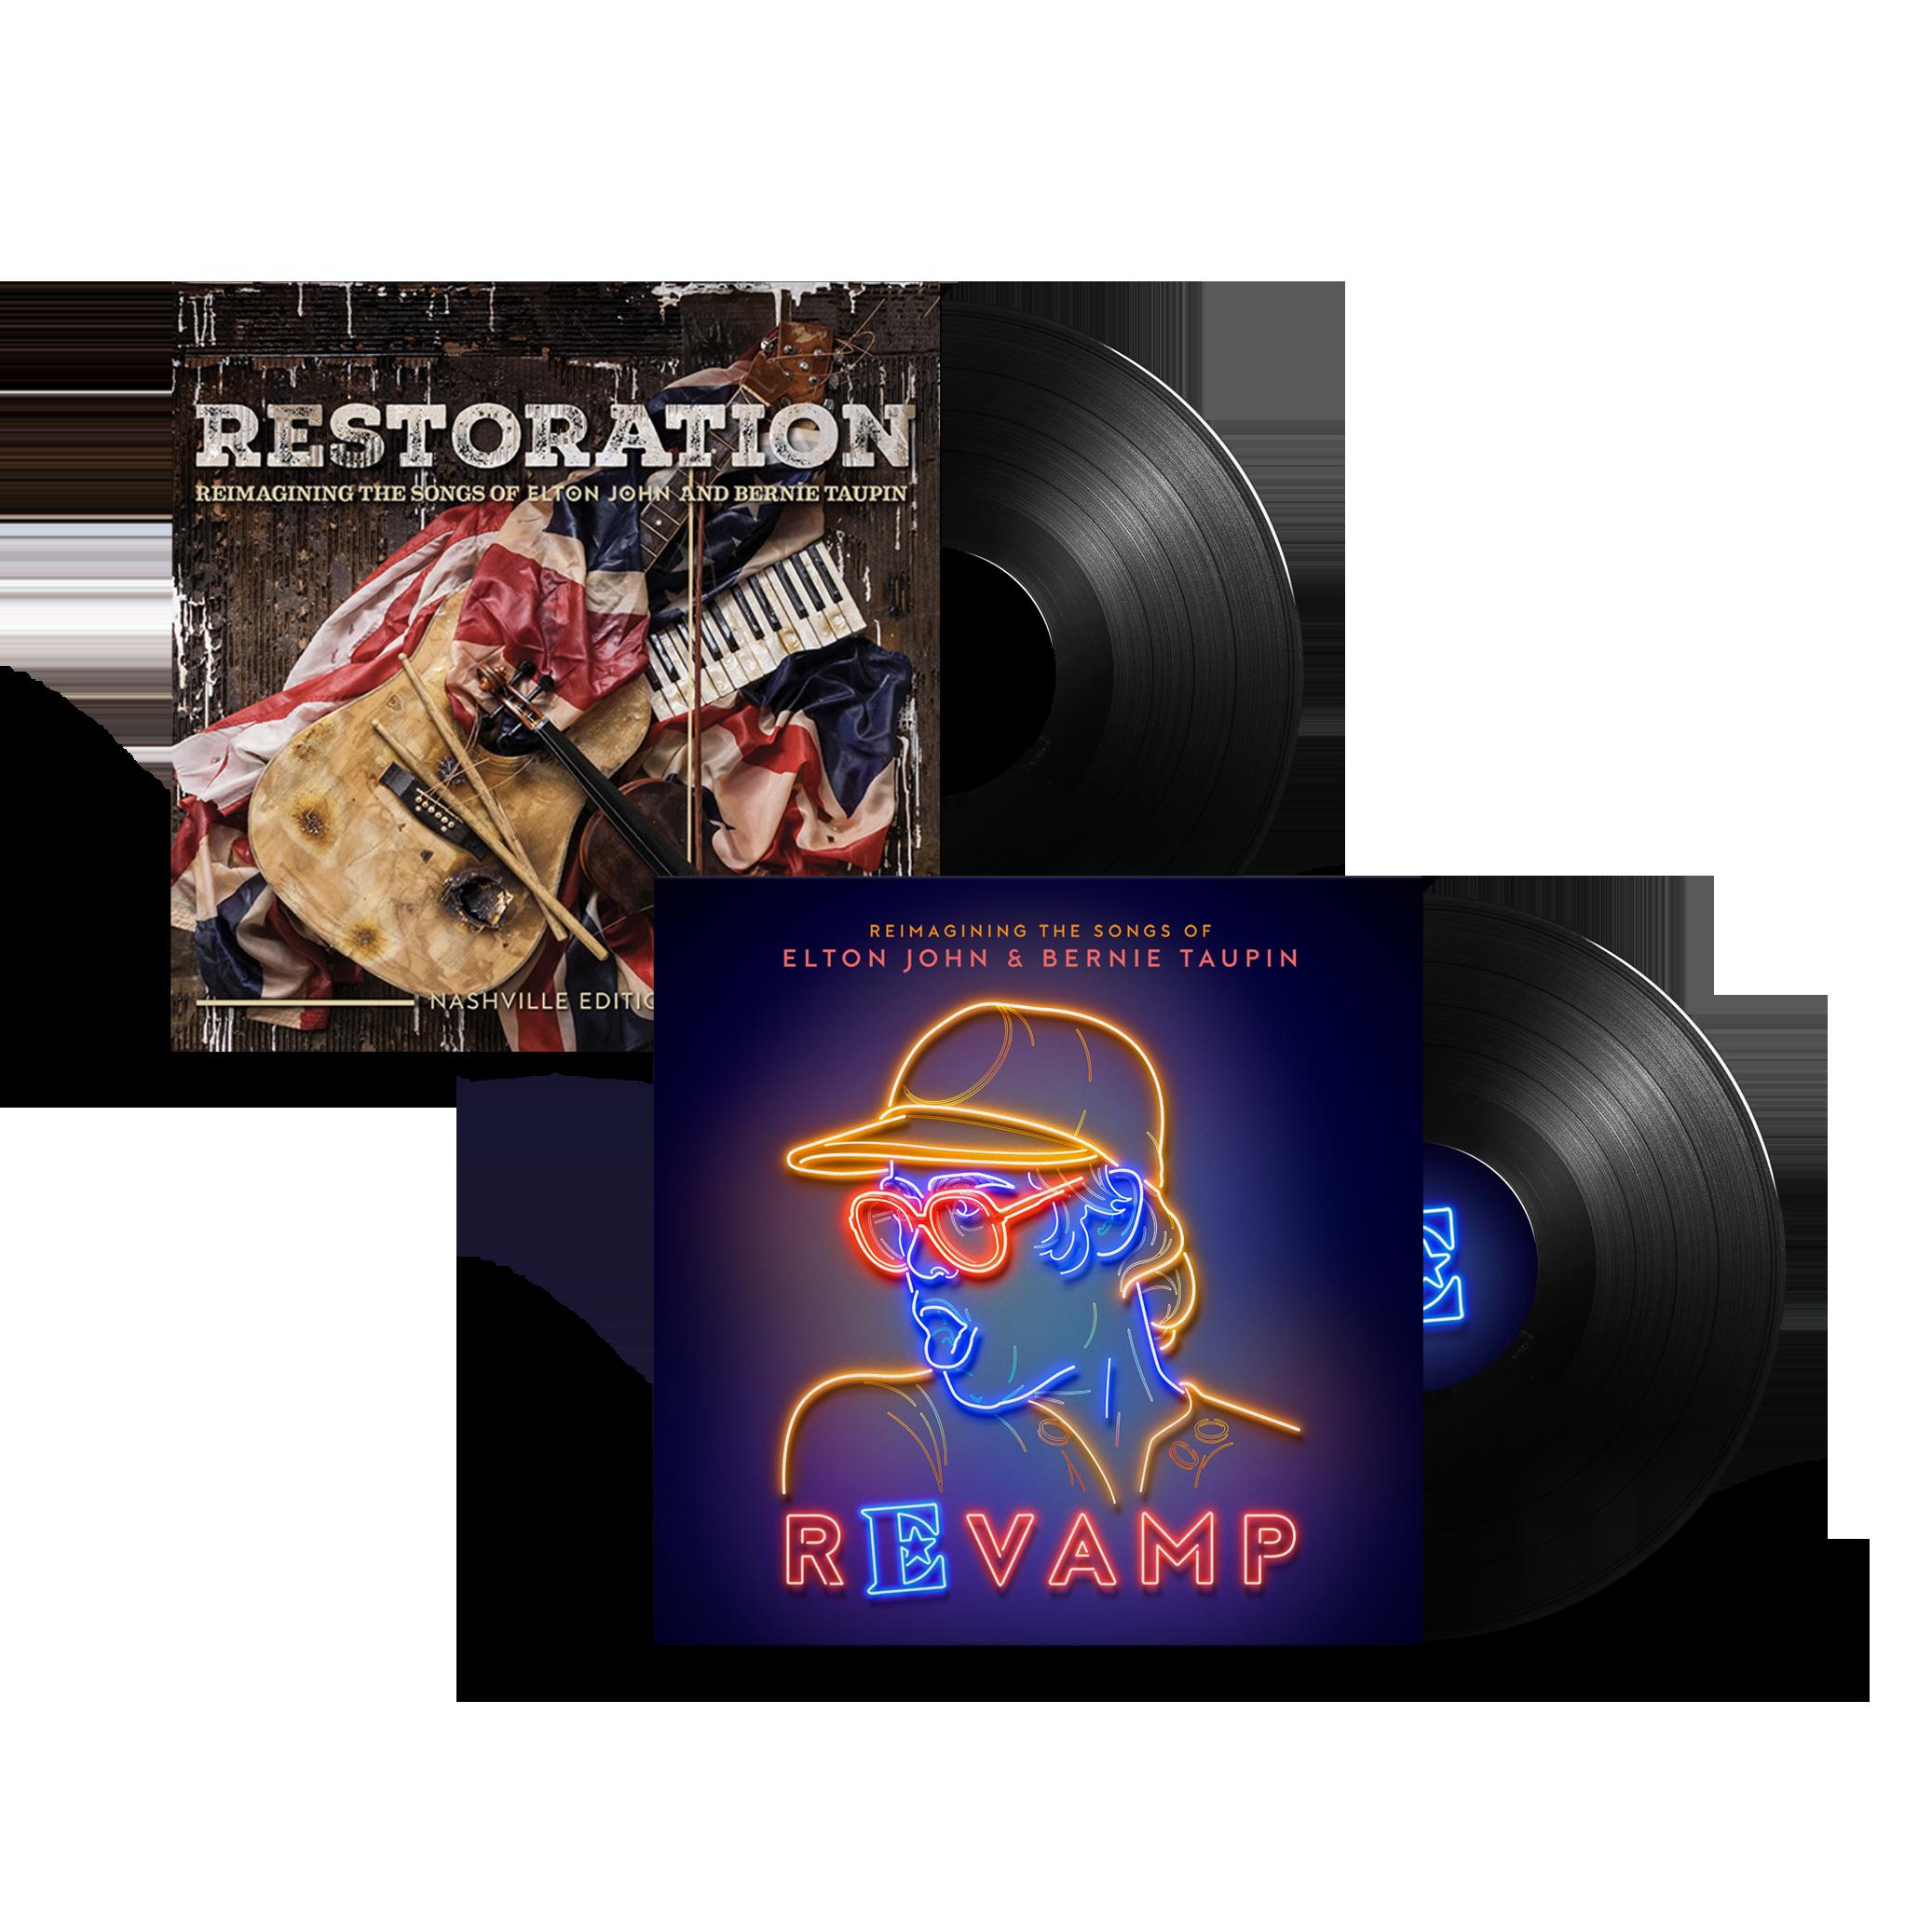 Elton John: 'Revamp' & 'Restoration' LP Collection